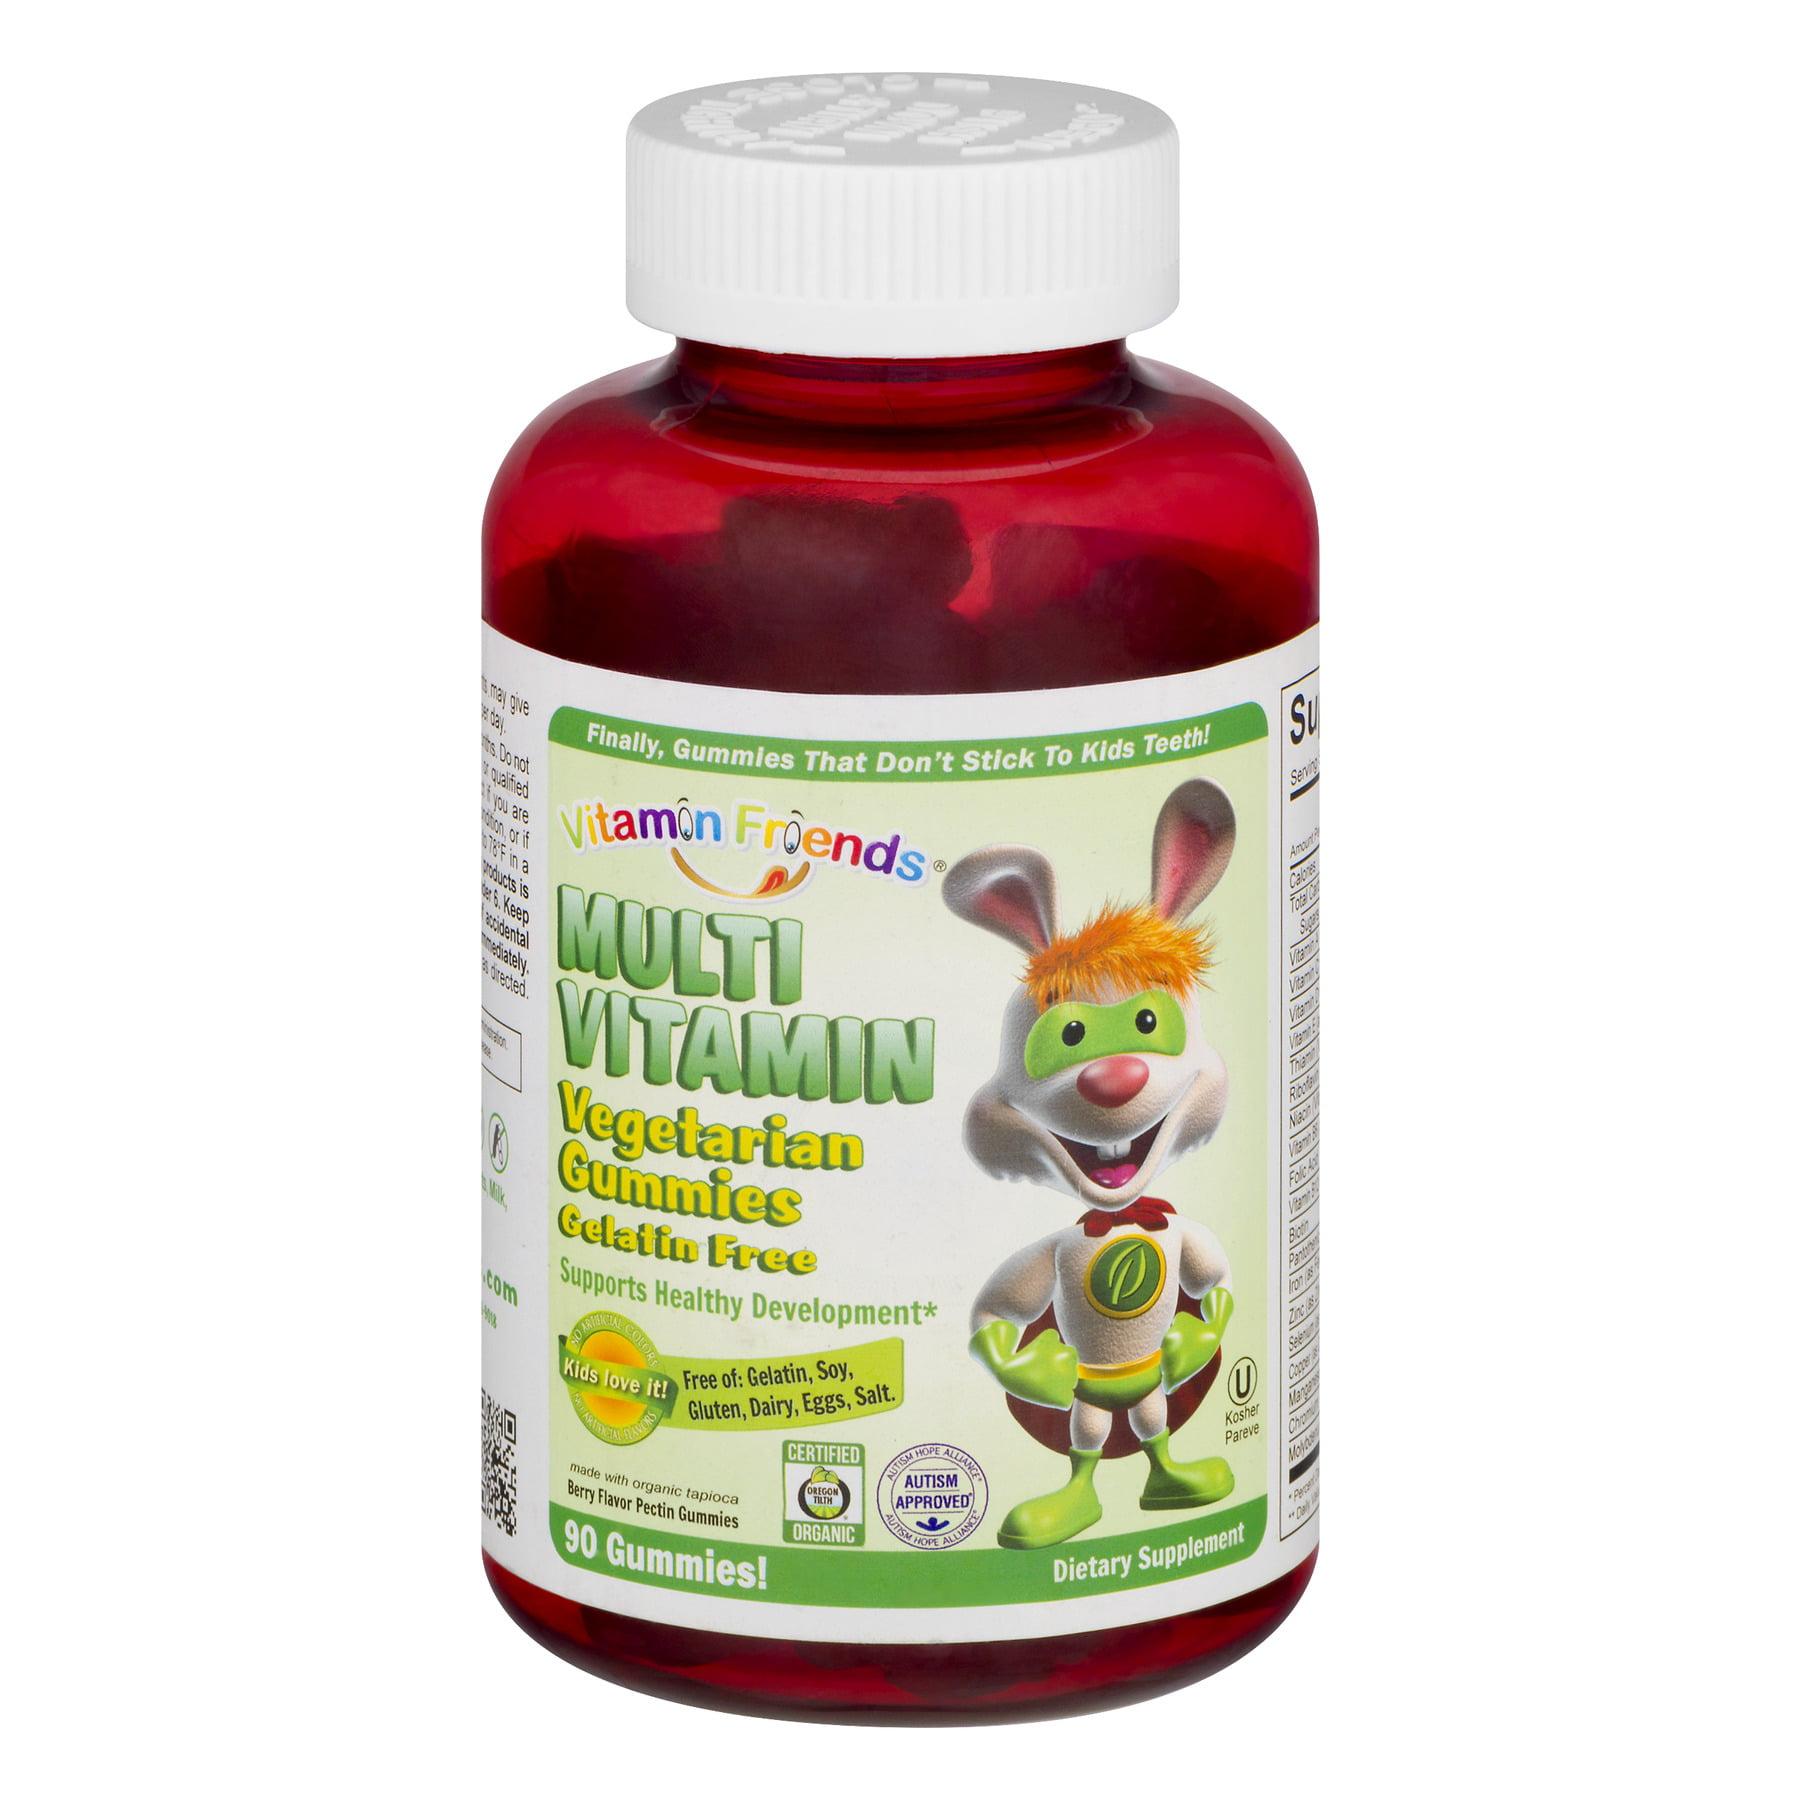 Vitamin Friends Multi Vitamin Vegetarian Gummies - 90 CT90.0 CT